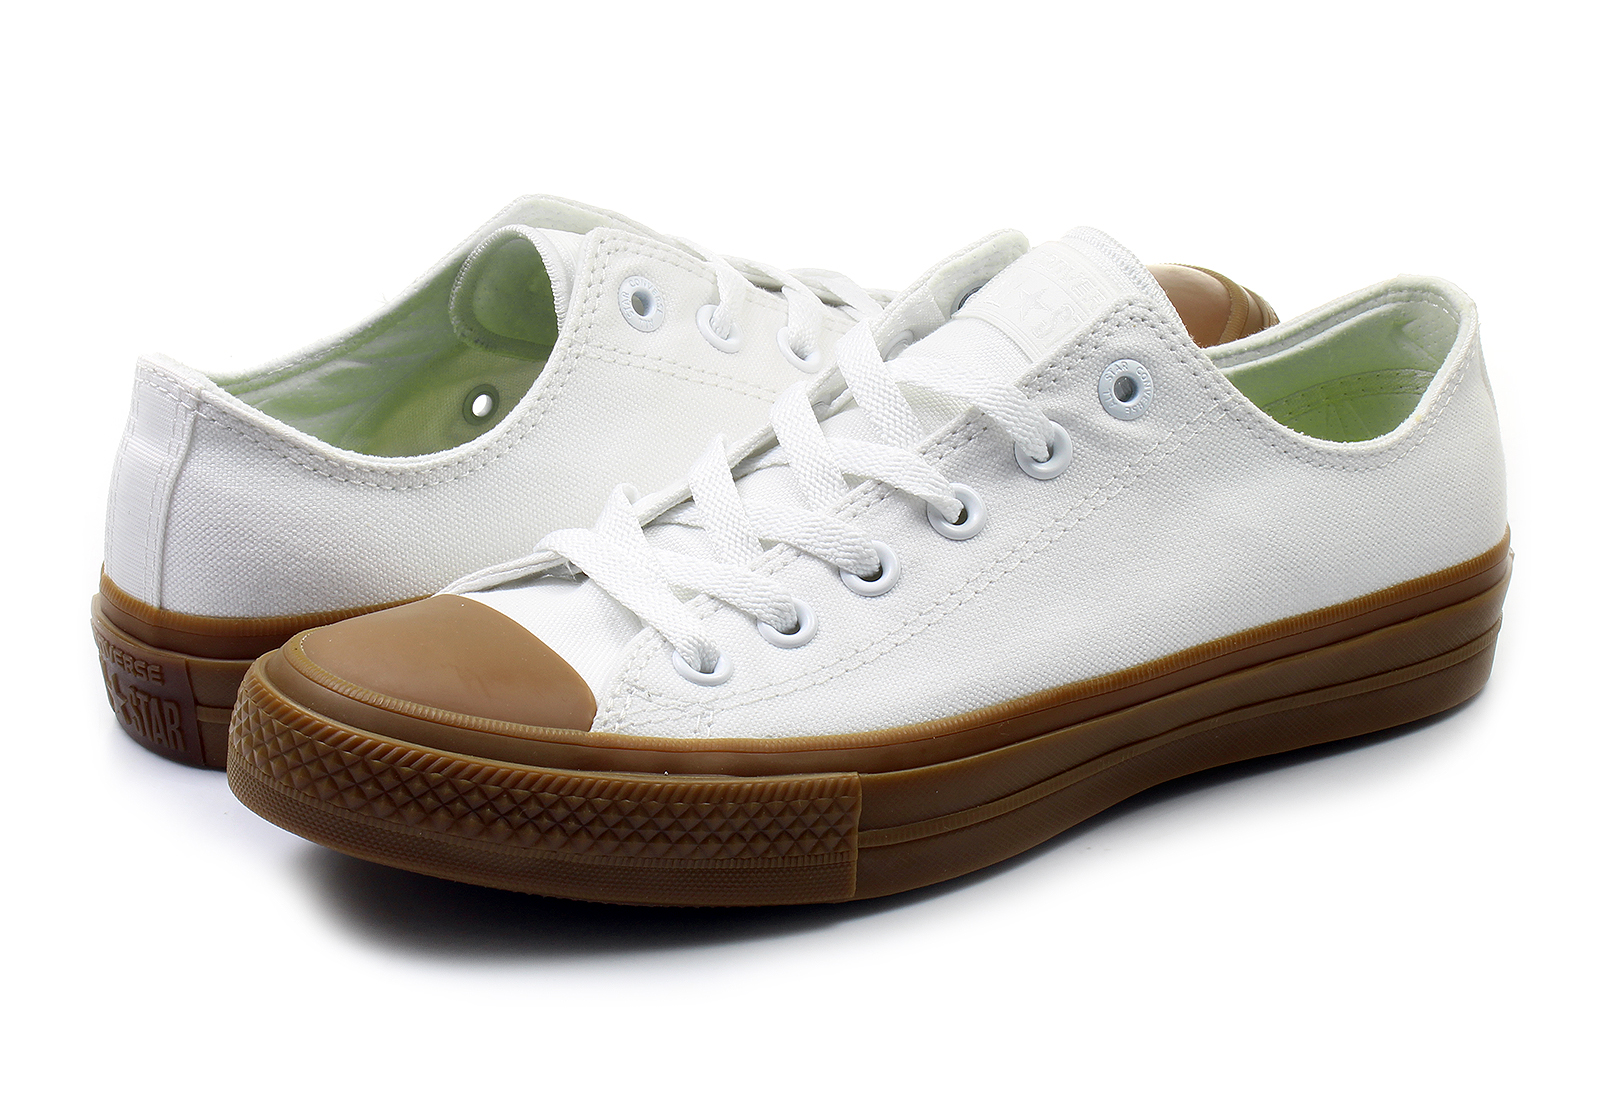 e2d9786cf705 Converse Sneakers - Chuck Taylor All Star II Gumsole Ox - 155502C ...